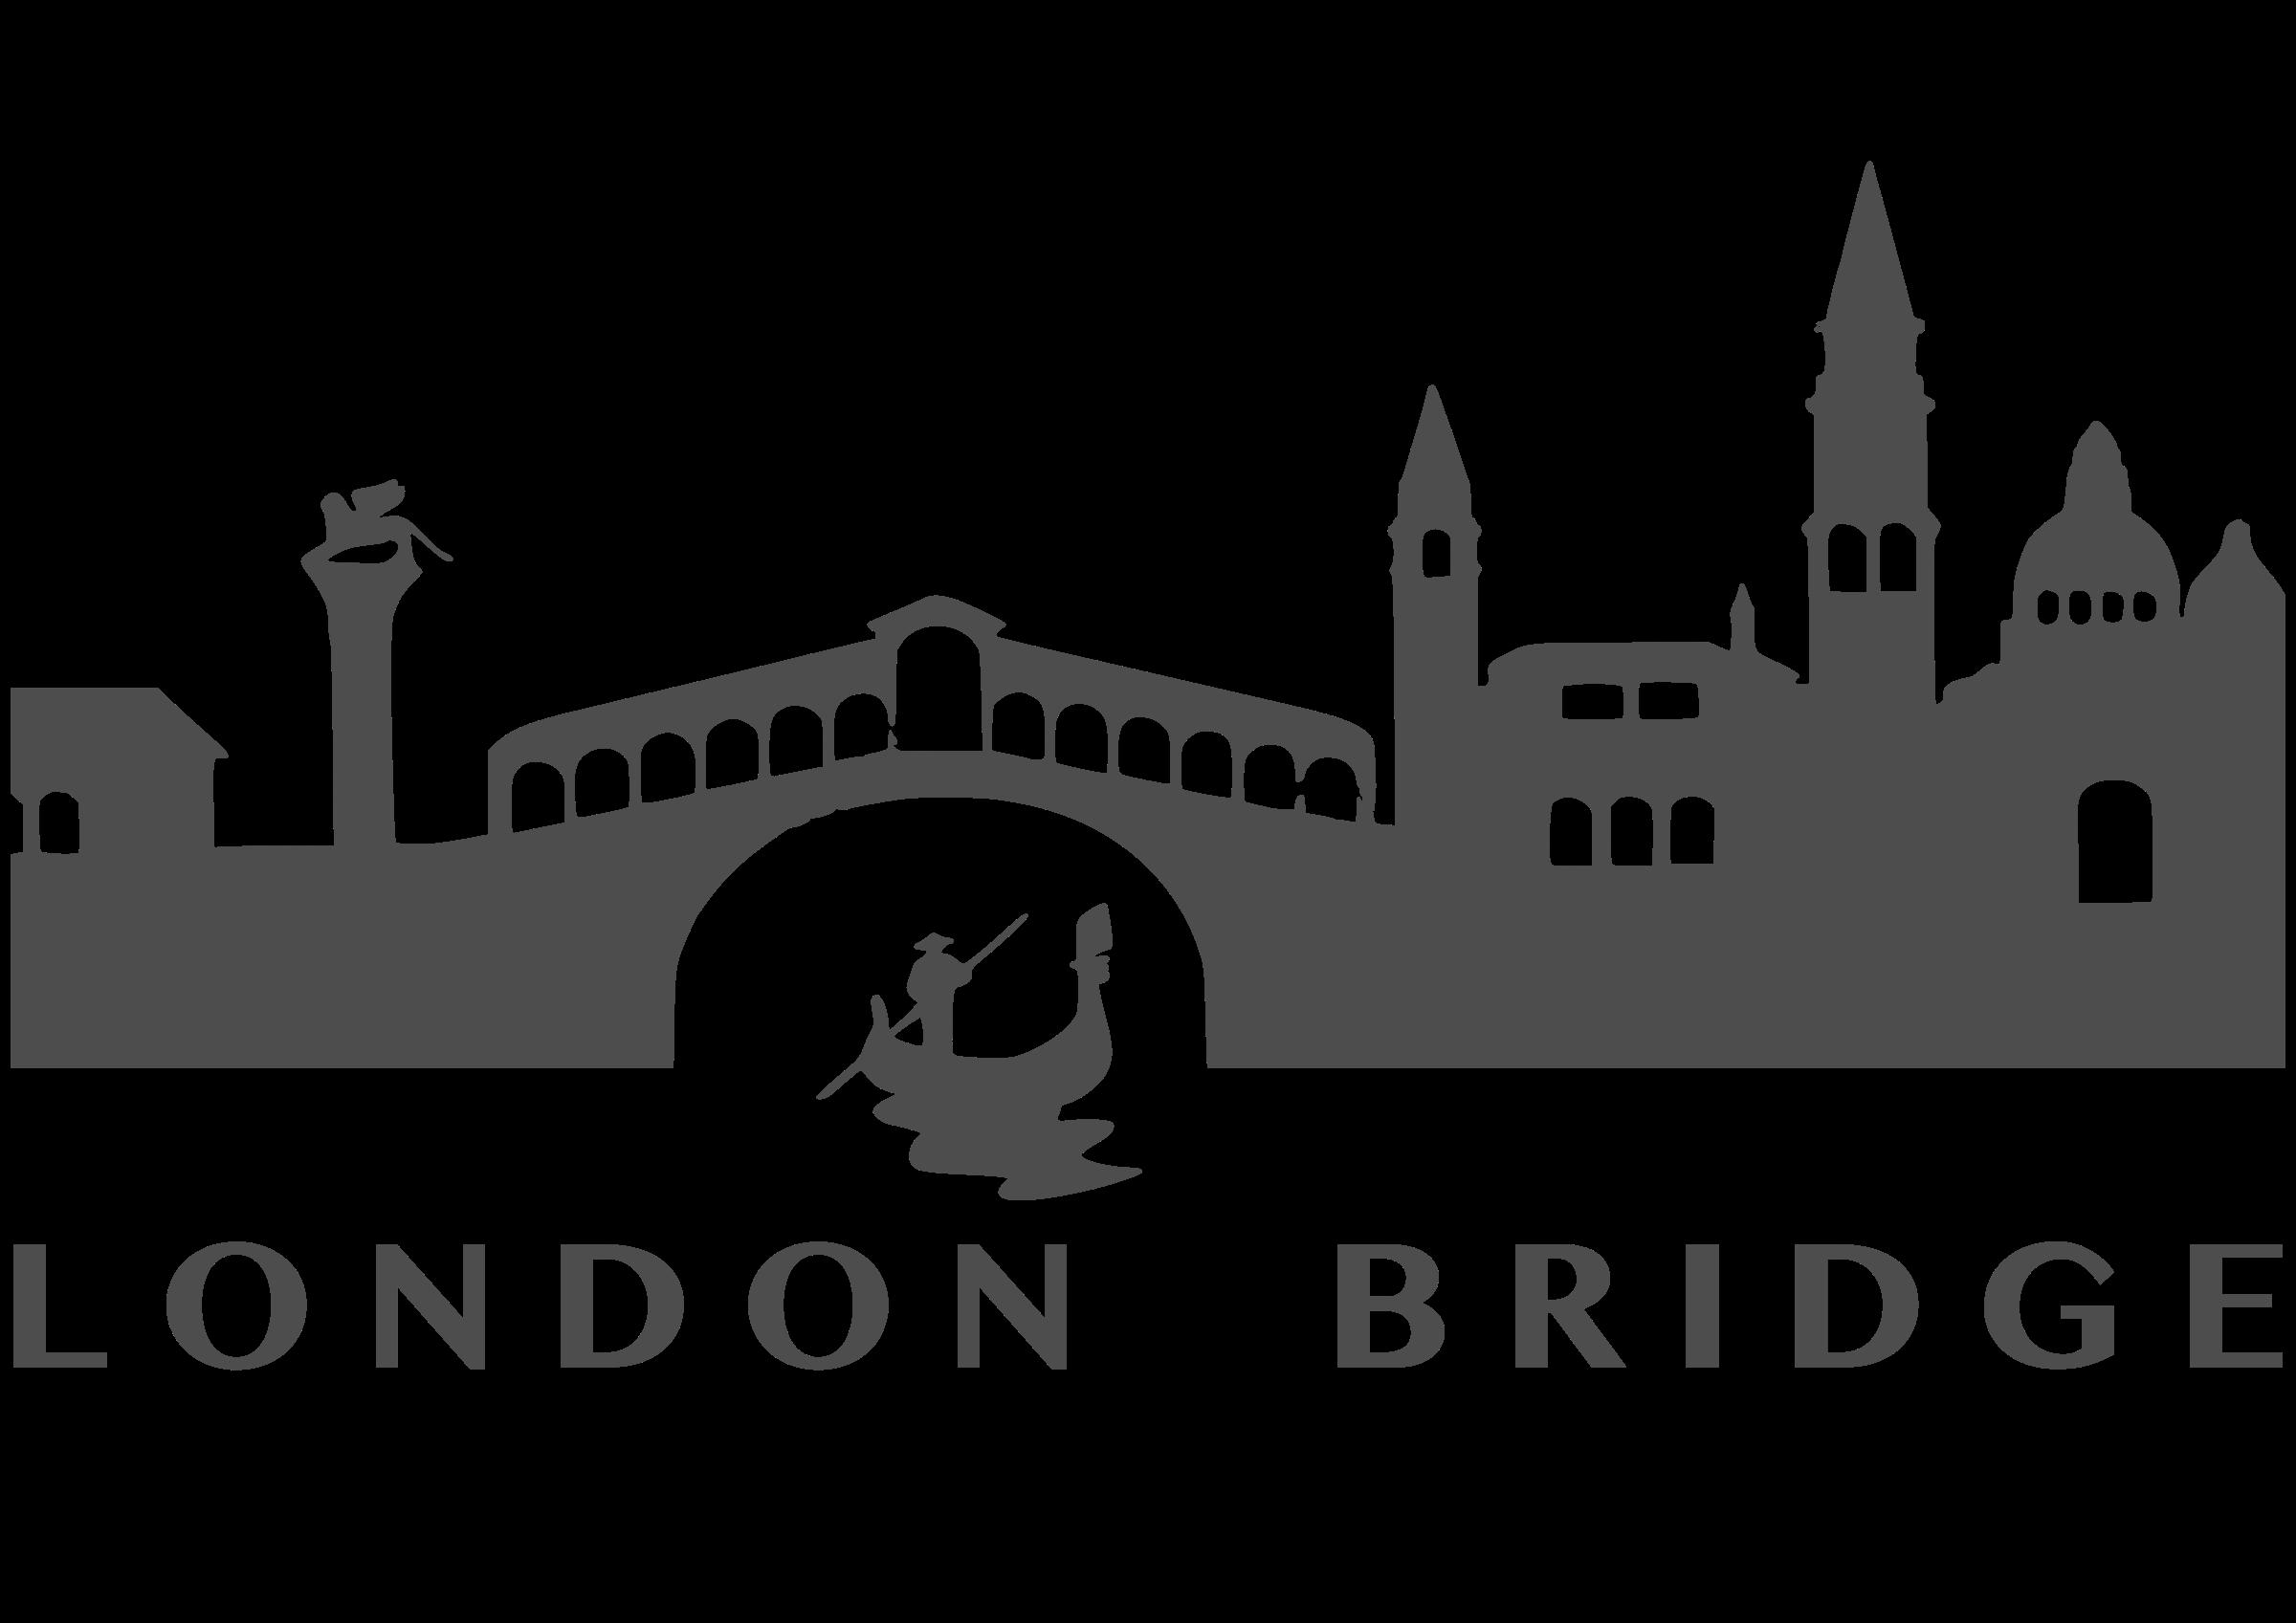 Logo clipart bridge. London big image png